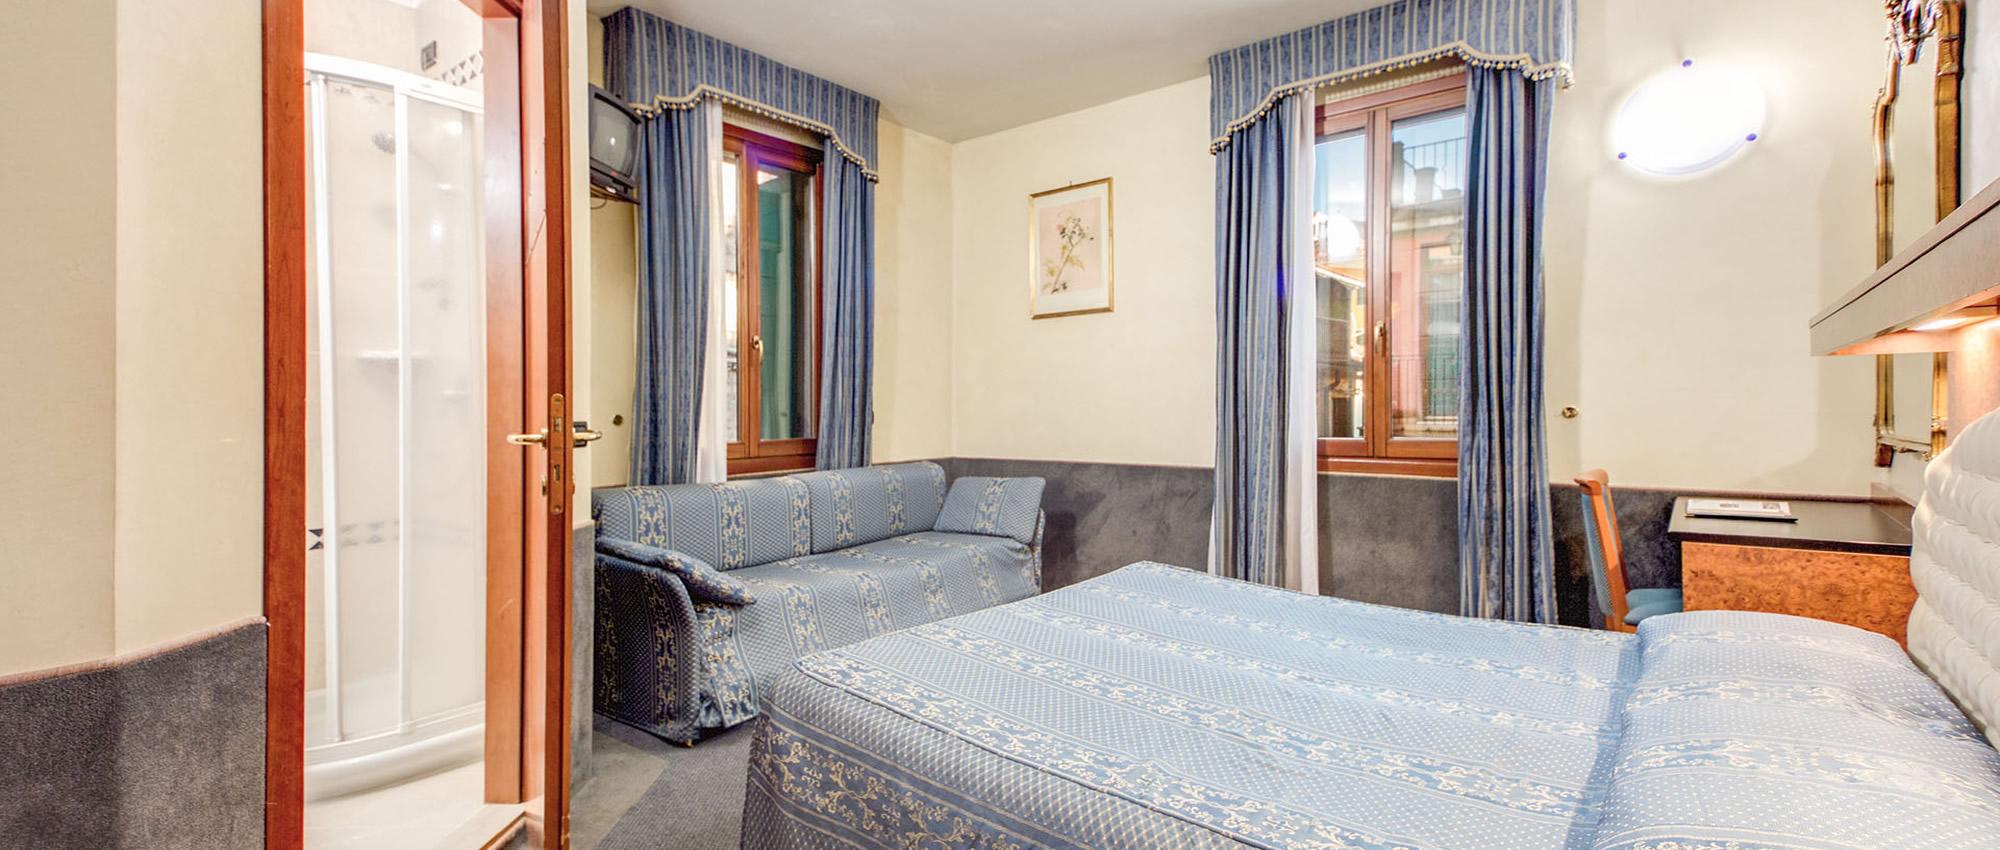 Hotel Atlantide Venice Official Site 2 Star Hotel